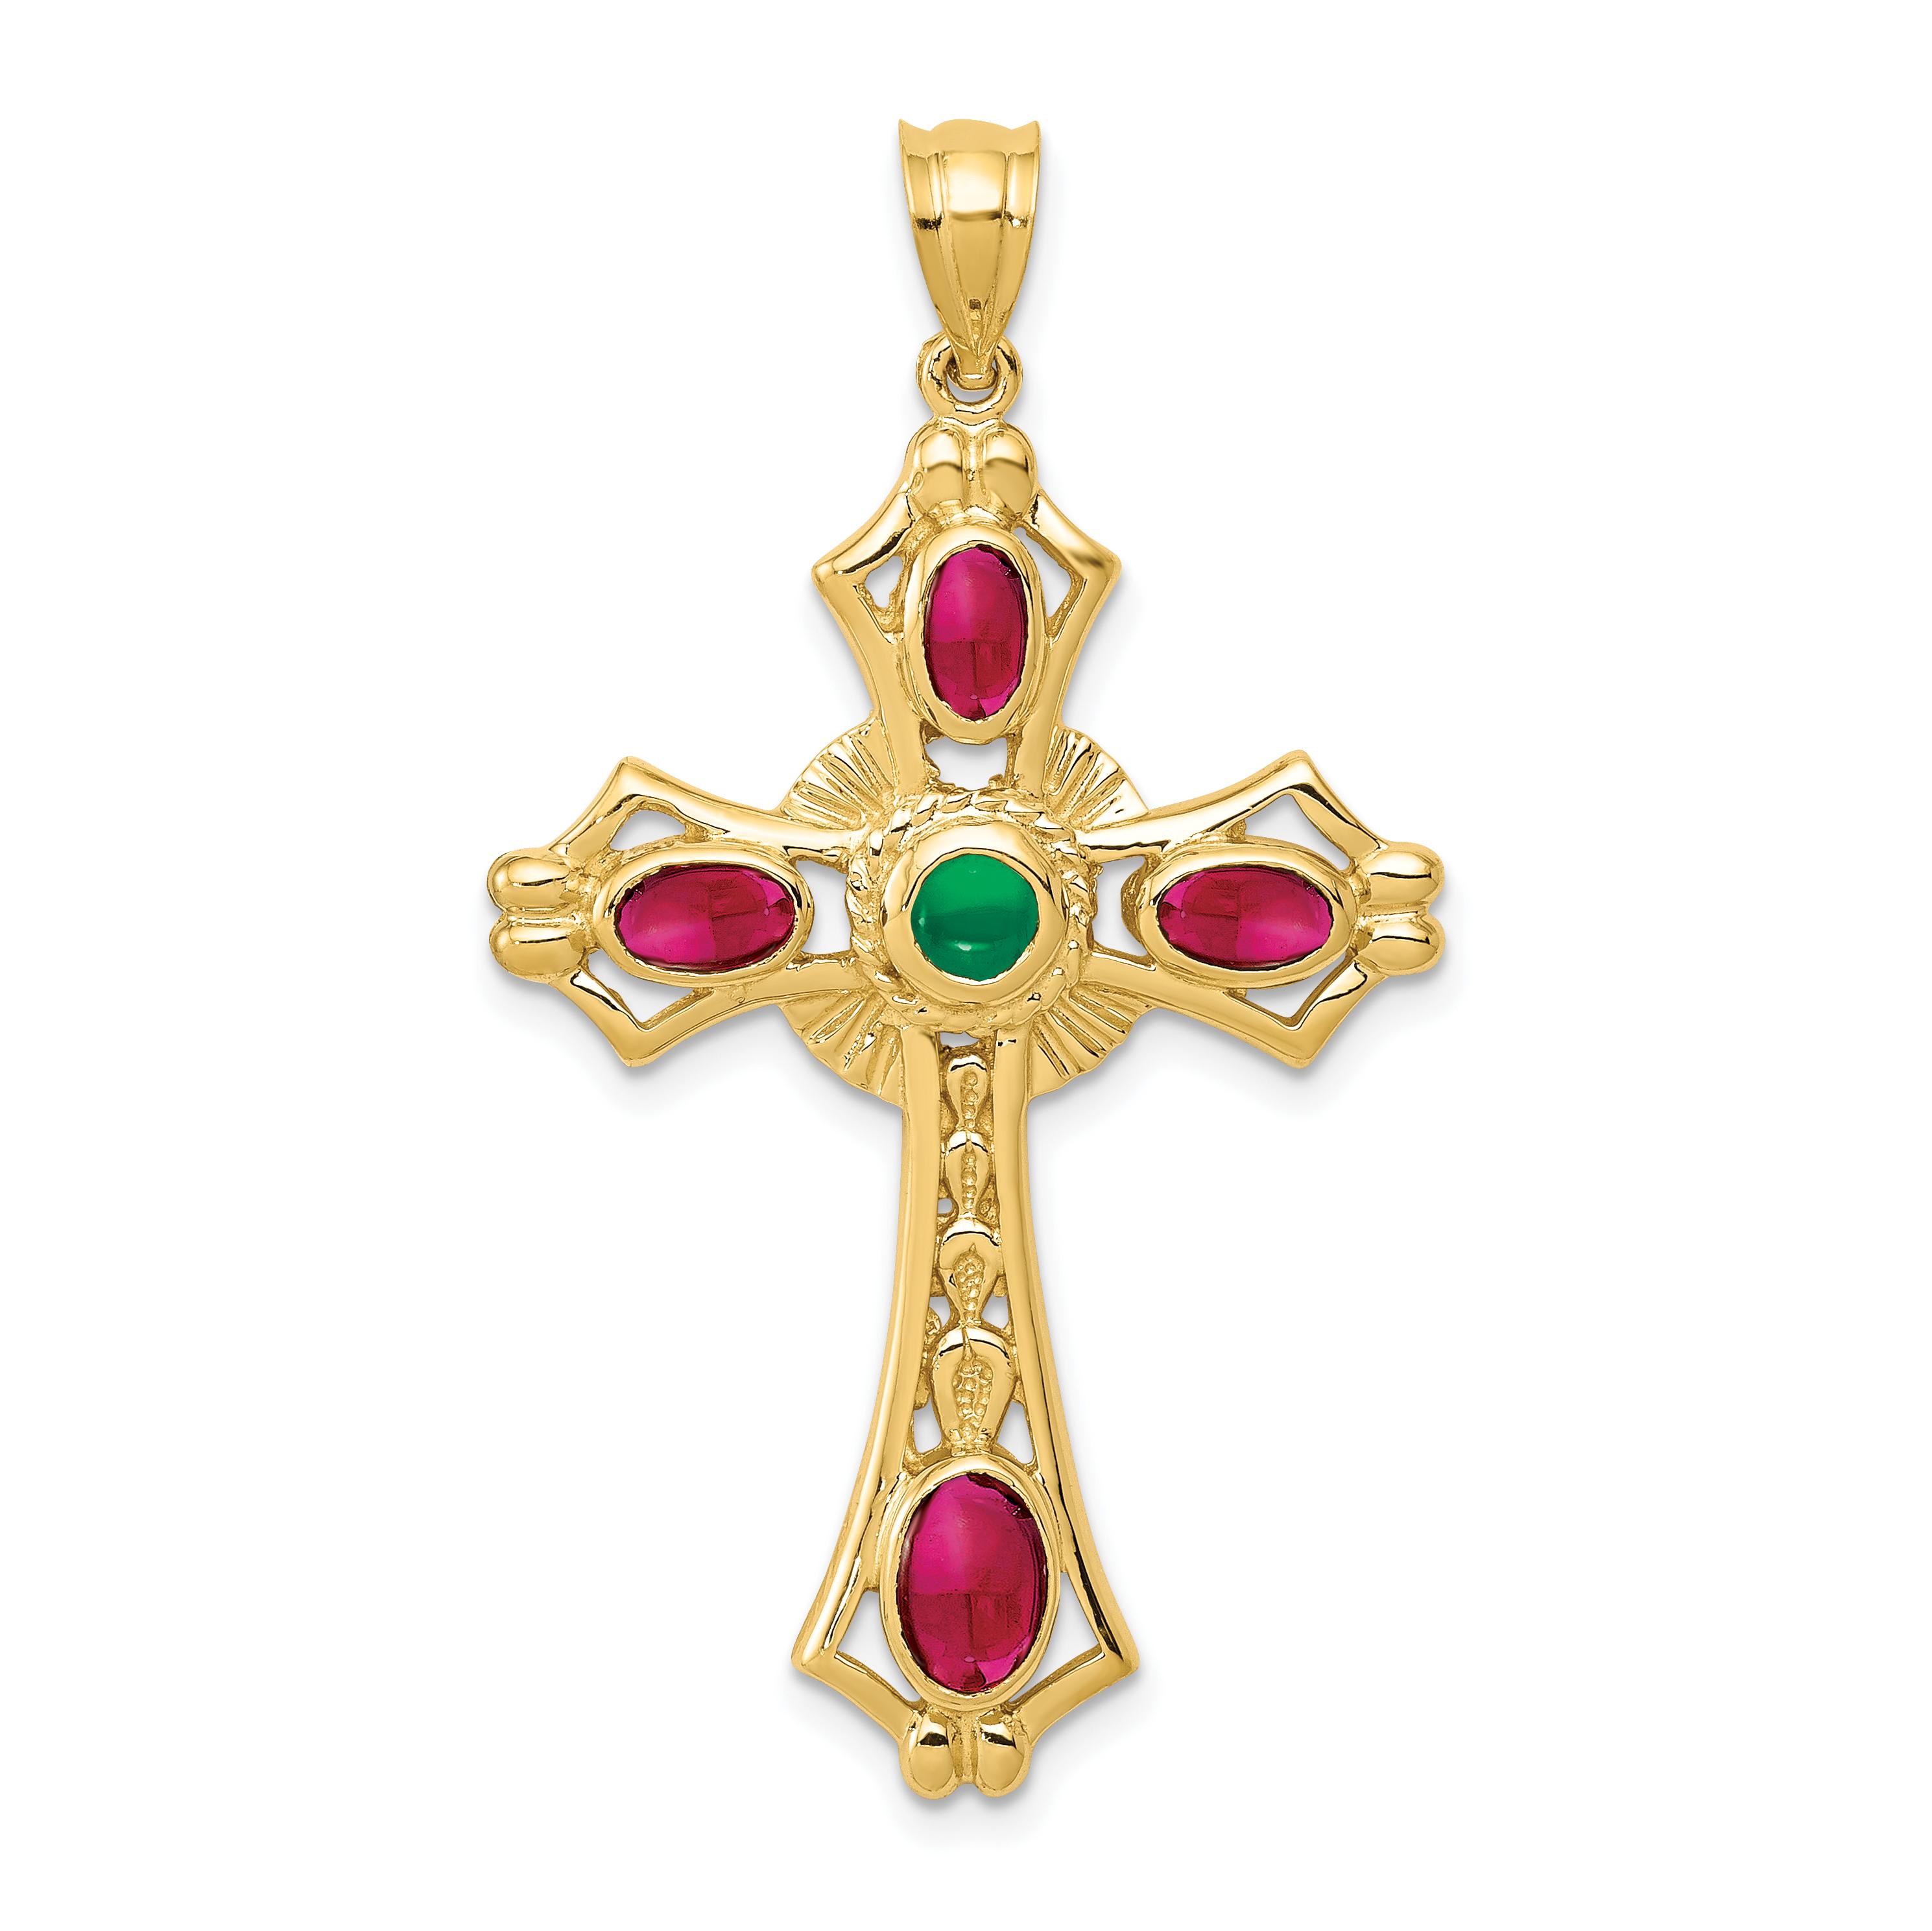 14k Ruby & Emerald Cabochon Cross Pendant. Weight: 3.6, Length: 44, Width: 25